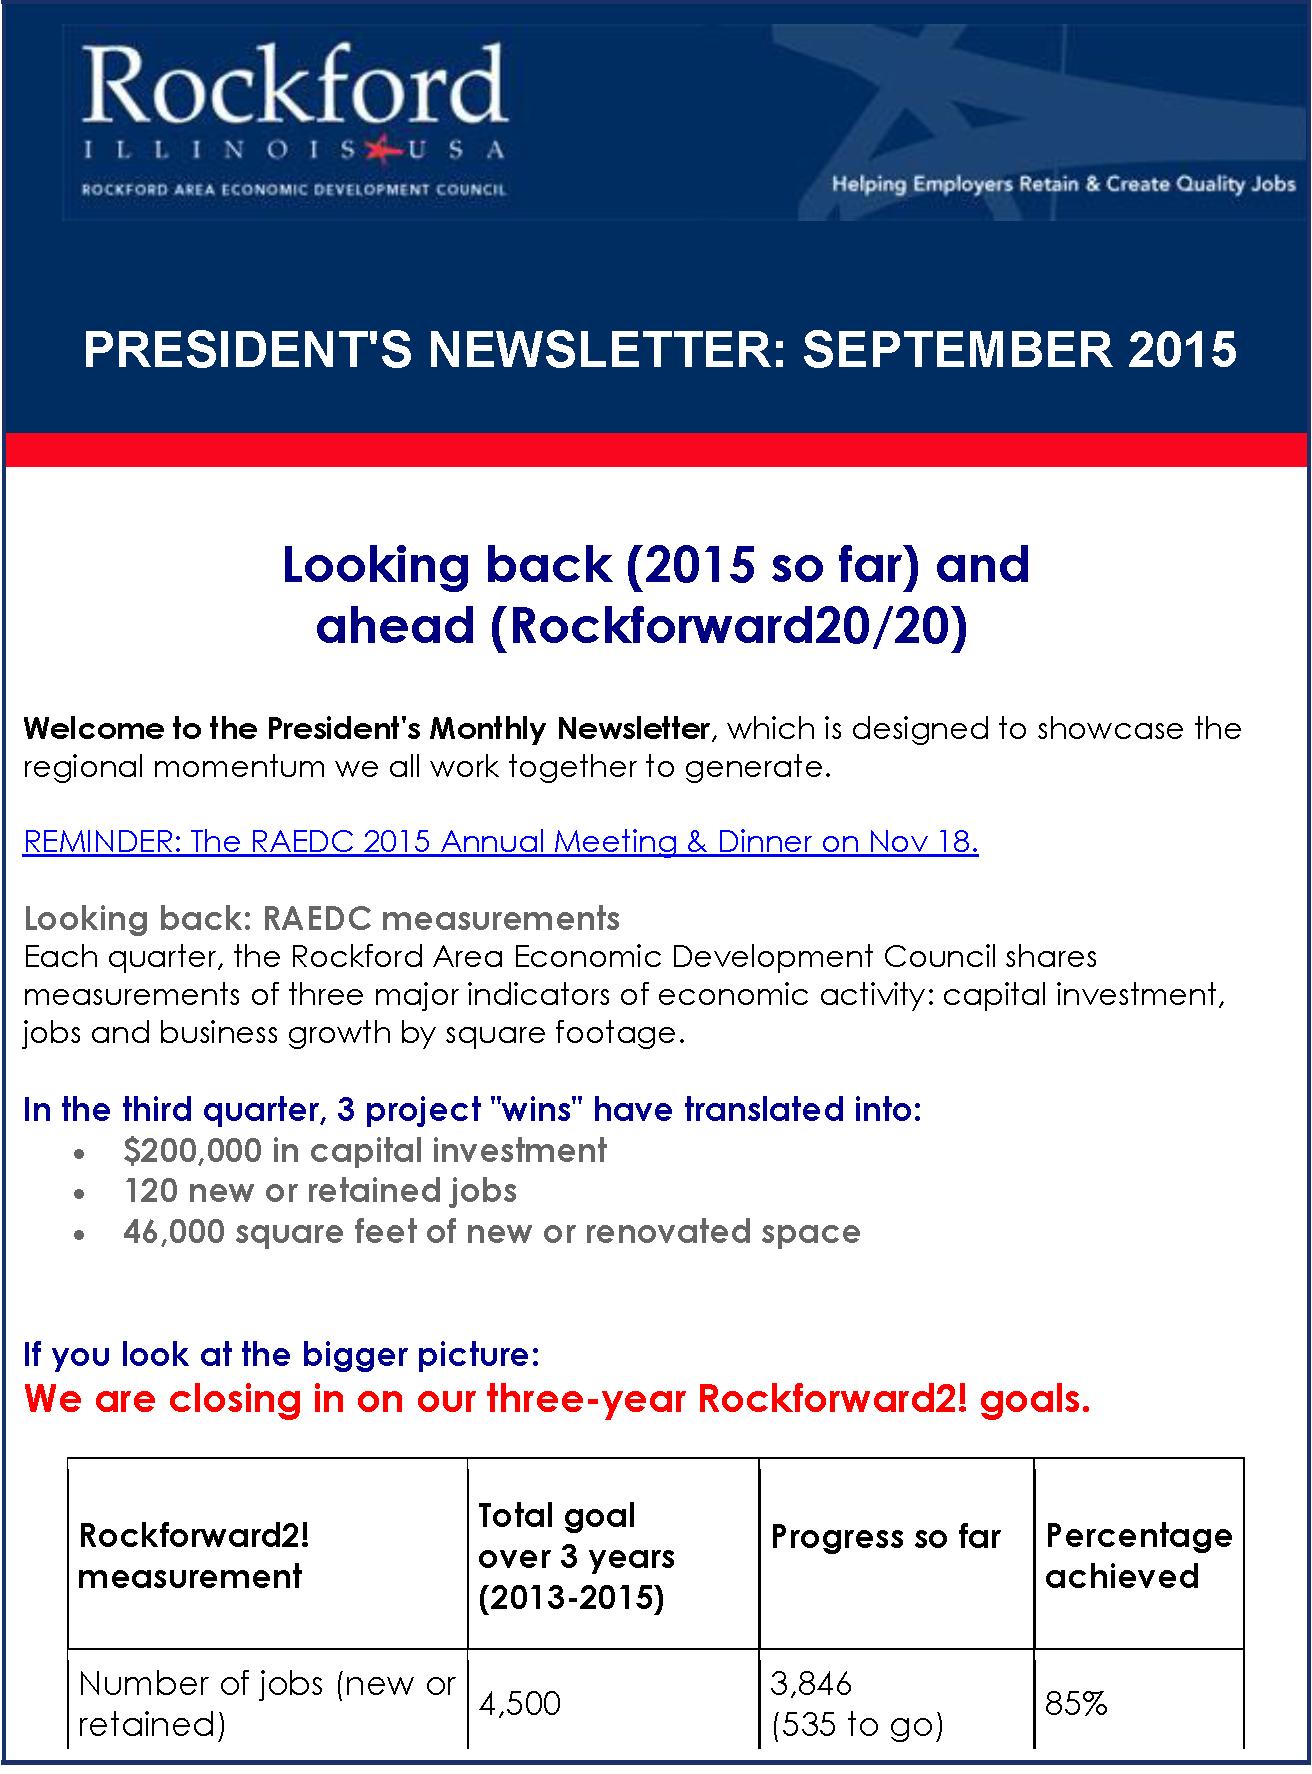 September President's Newsletter: Looking back and ahead (Rockforward 20/20)